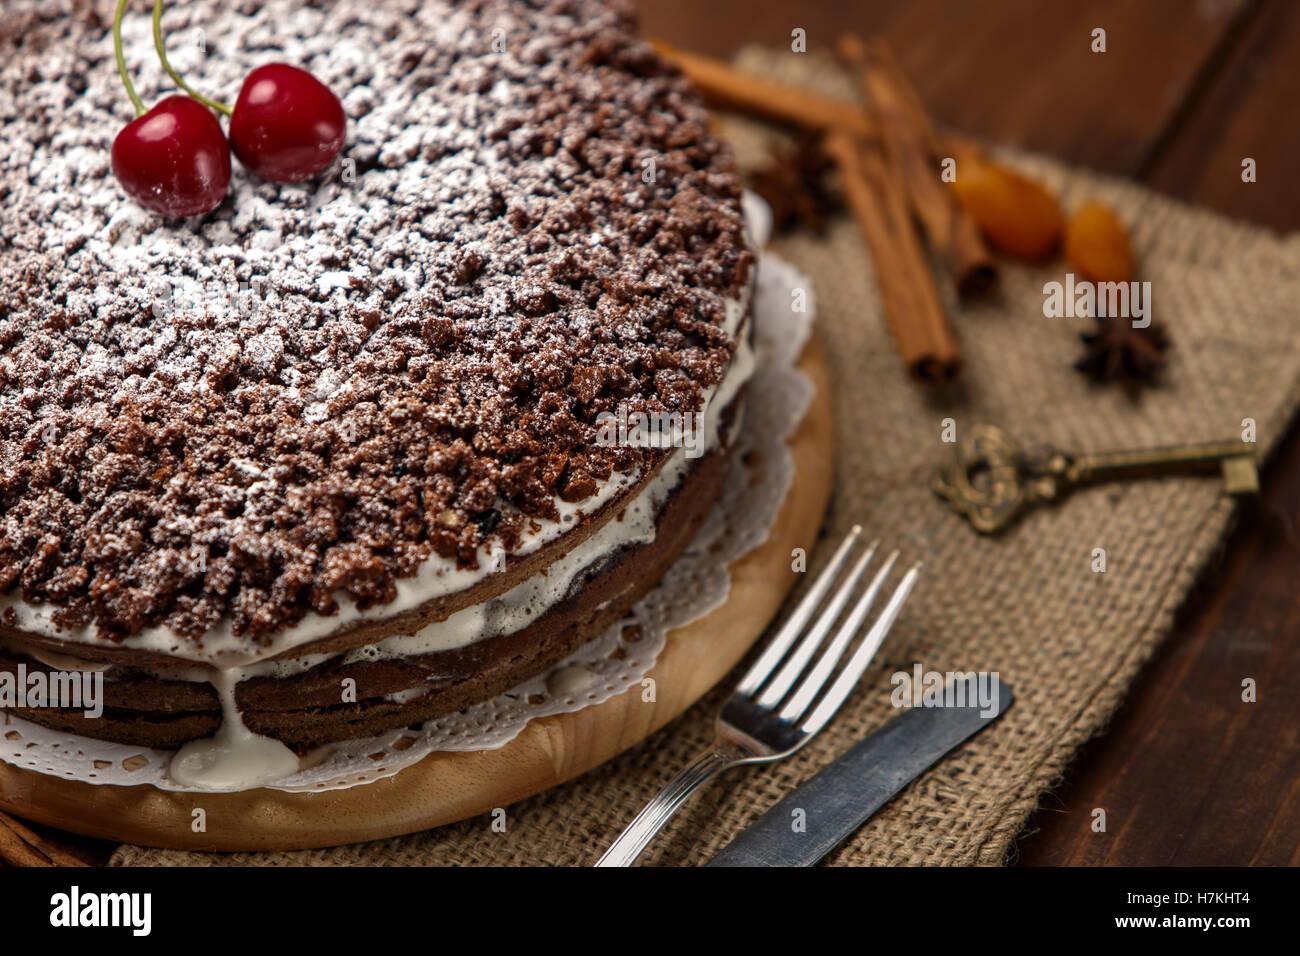 Homemade chocolate pie Stock Photo, Royalty Free Image: 125206260 ...